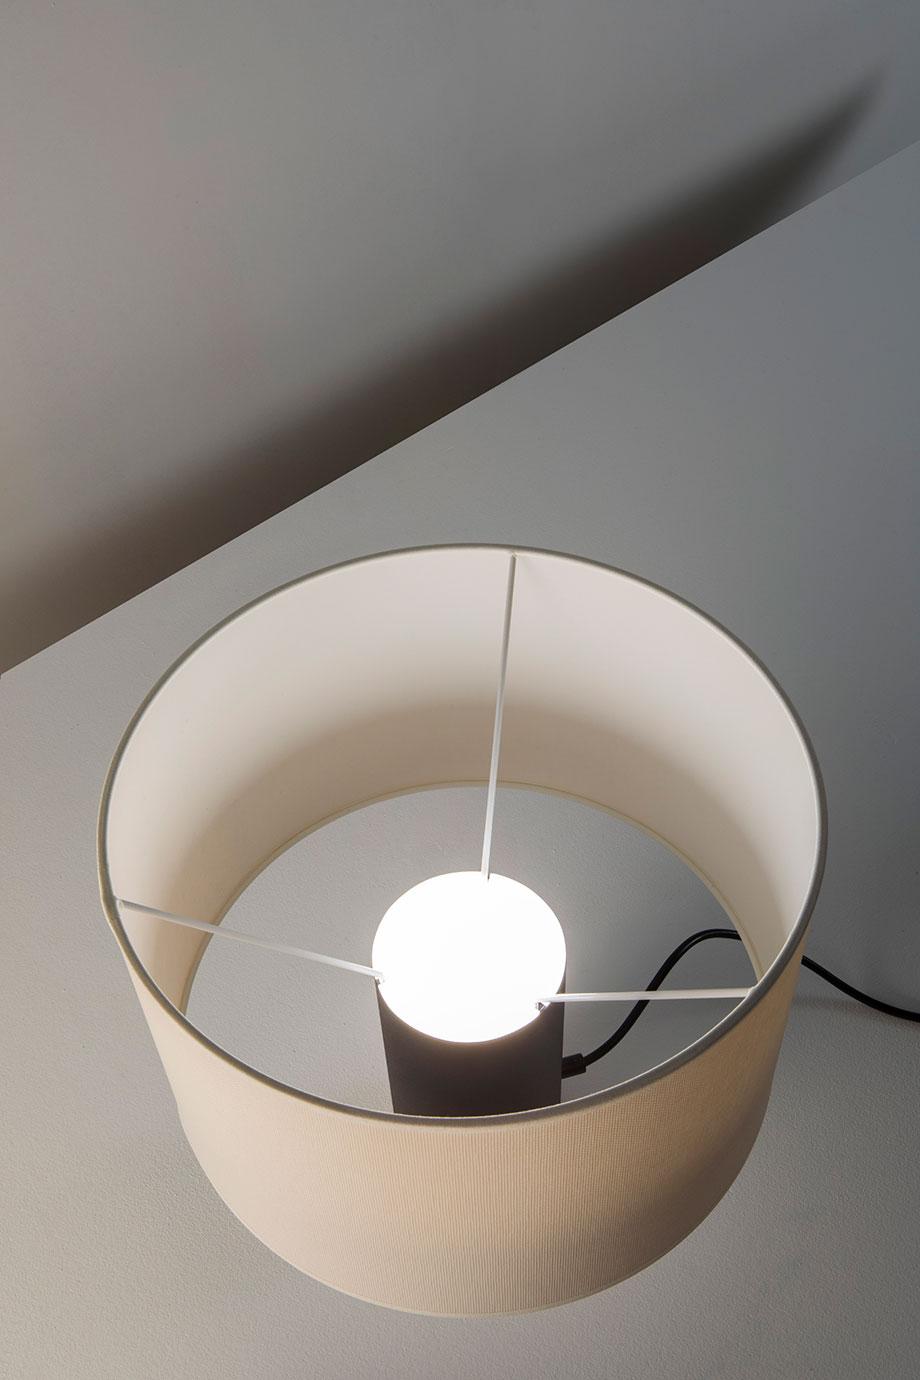 lamparas cyls de mermelada estudio para estiluz (9)